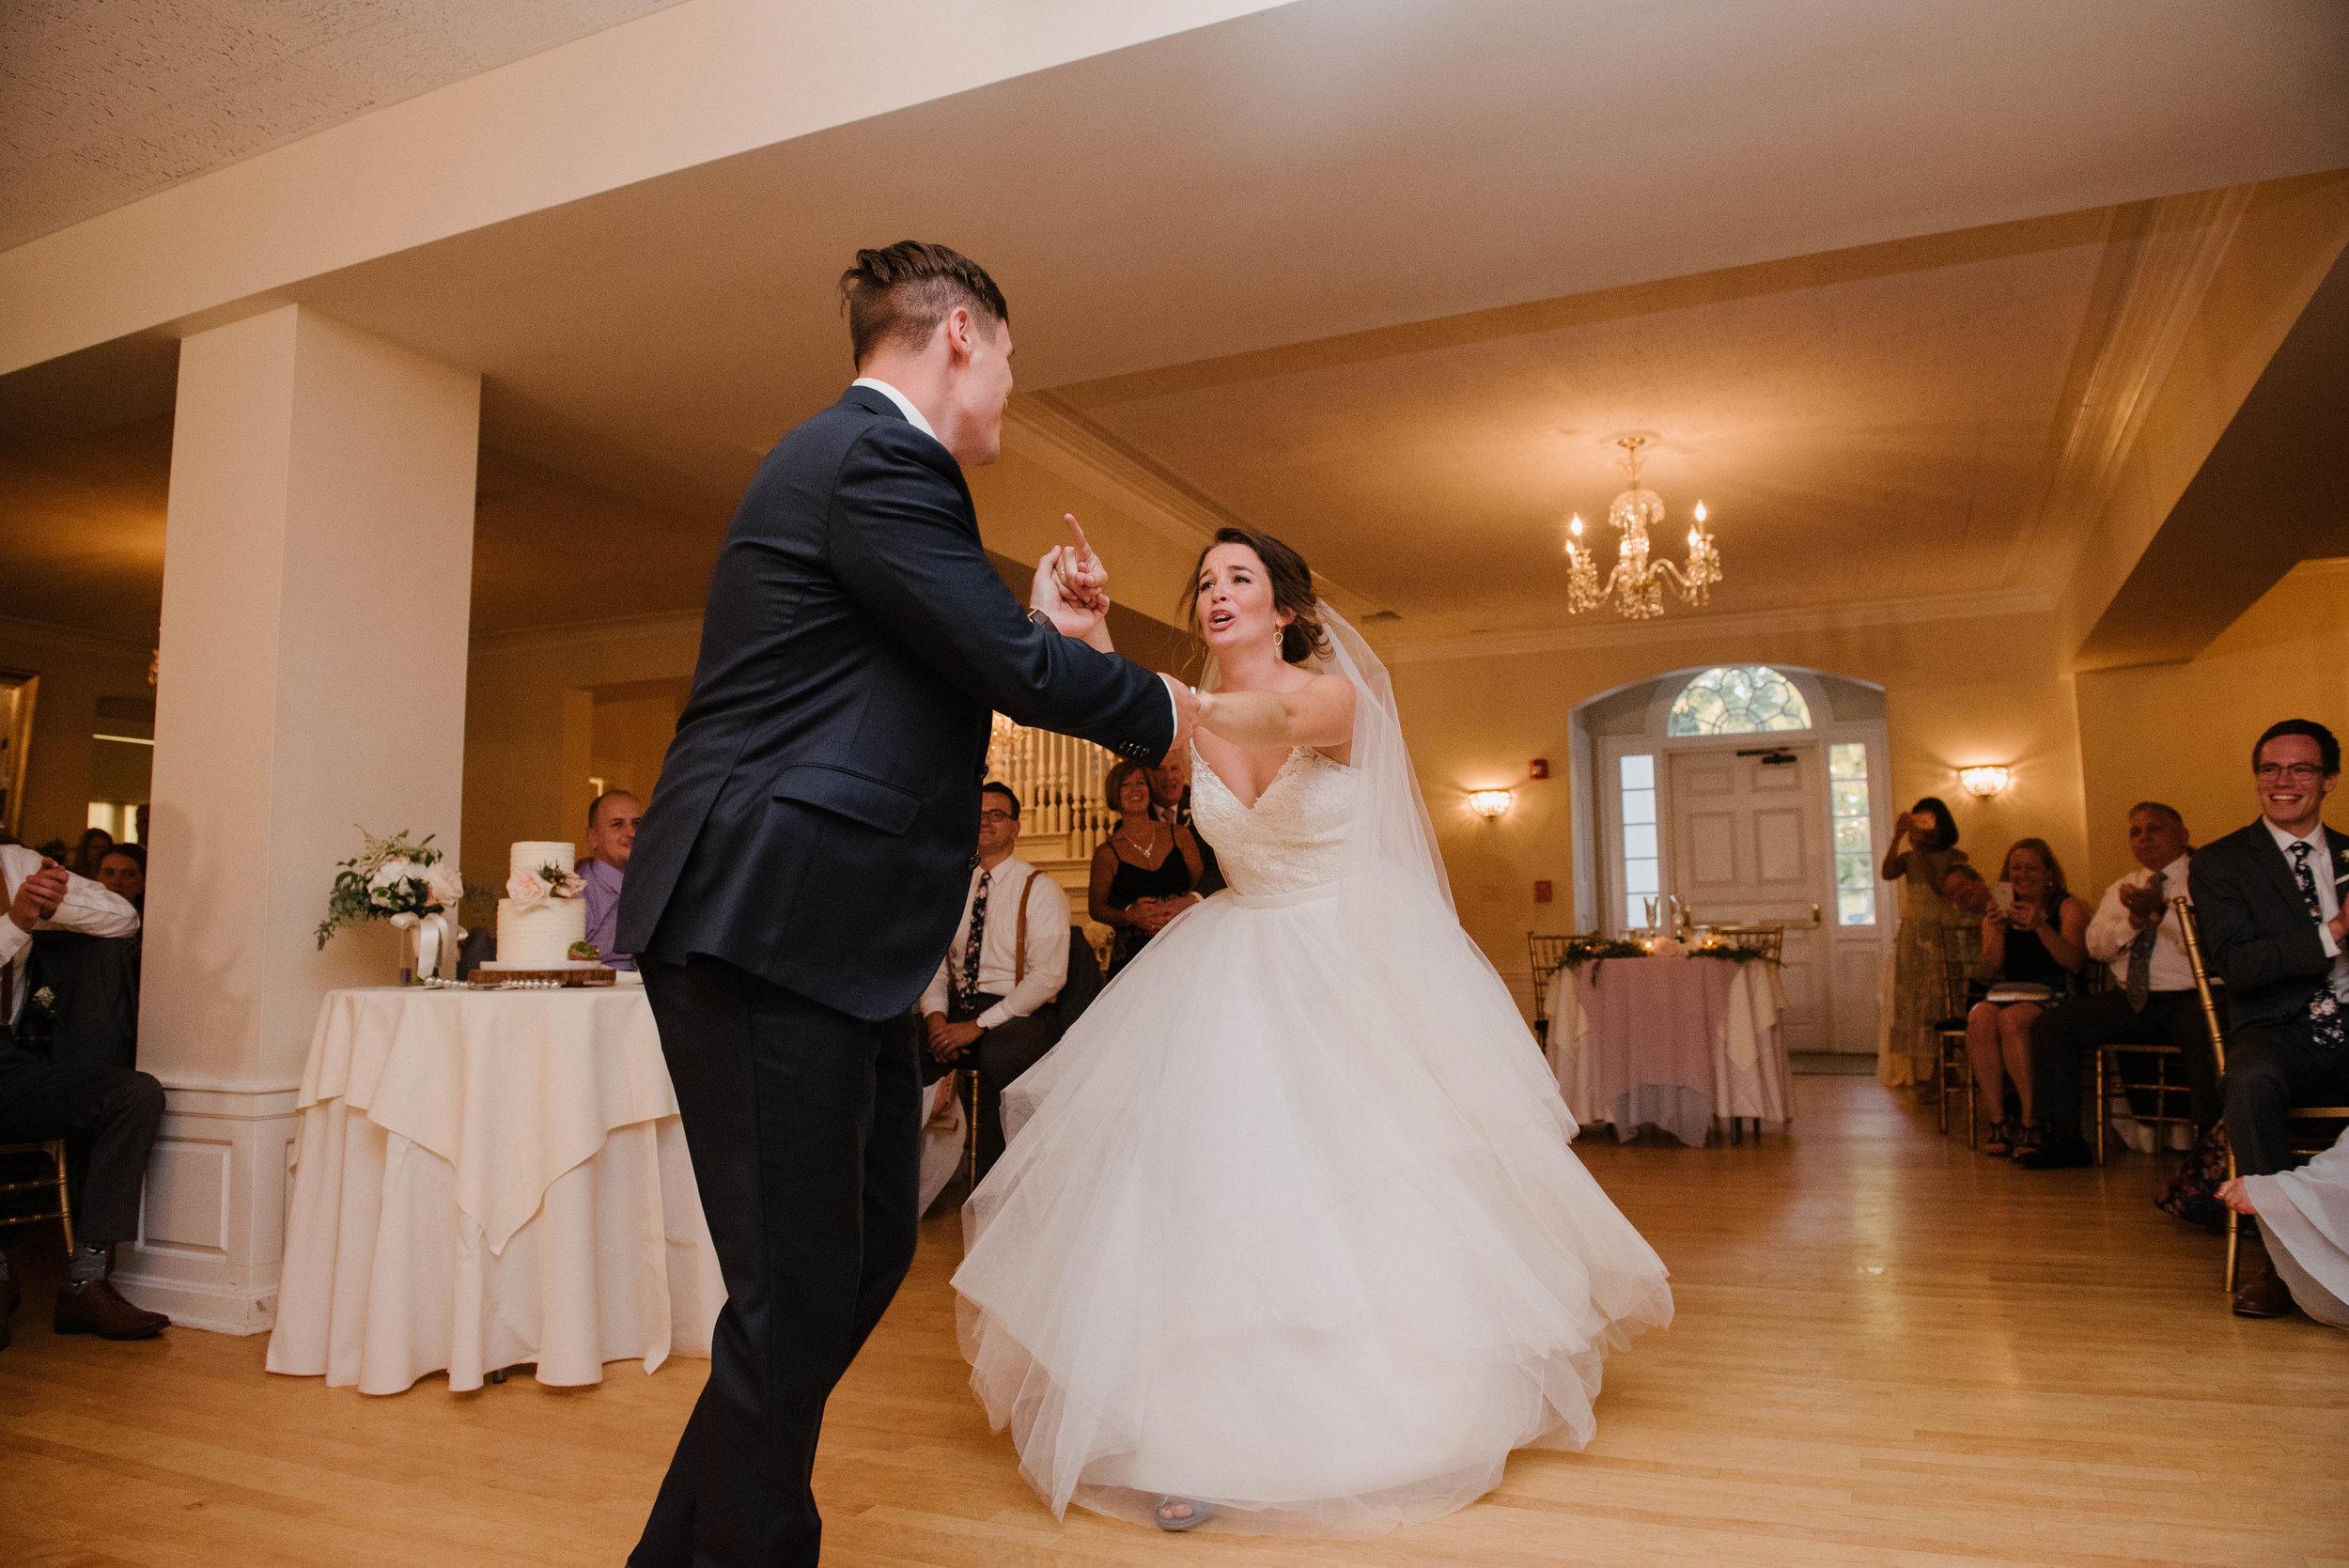 20_ipswich hellenic center wedding fifty one hale photography.jpg